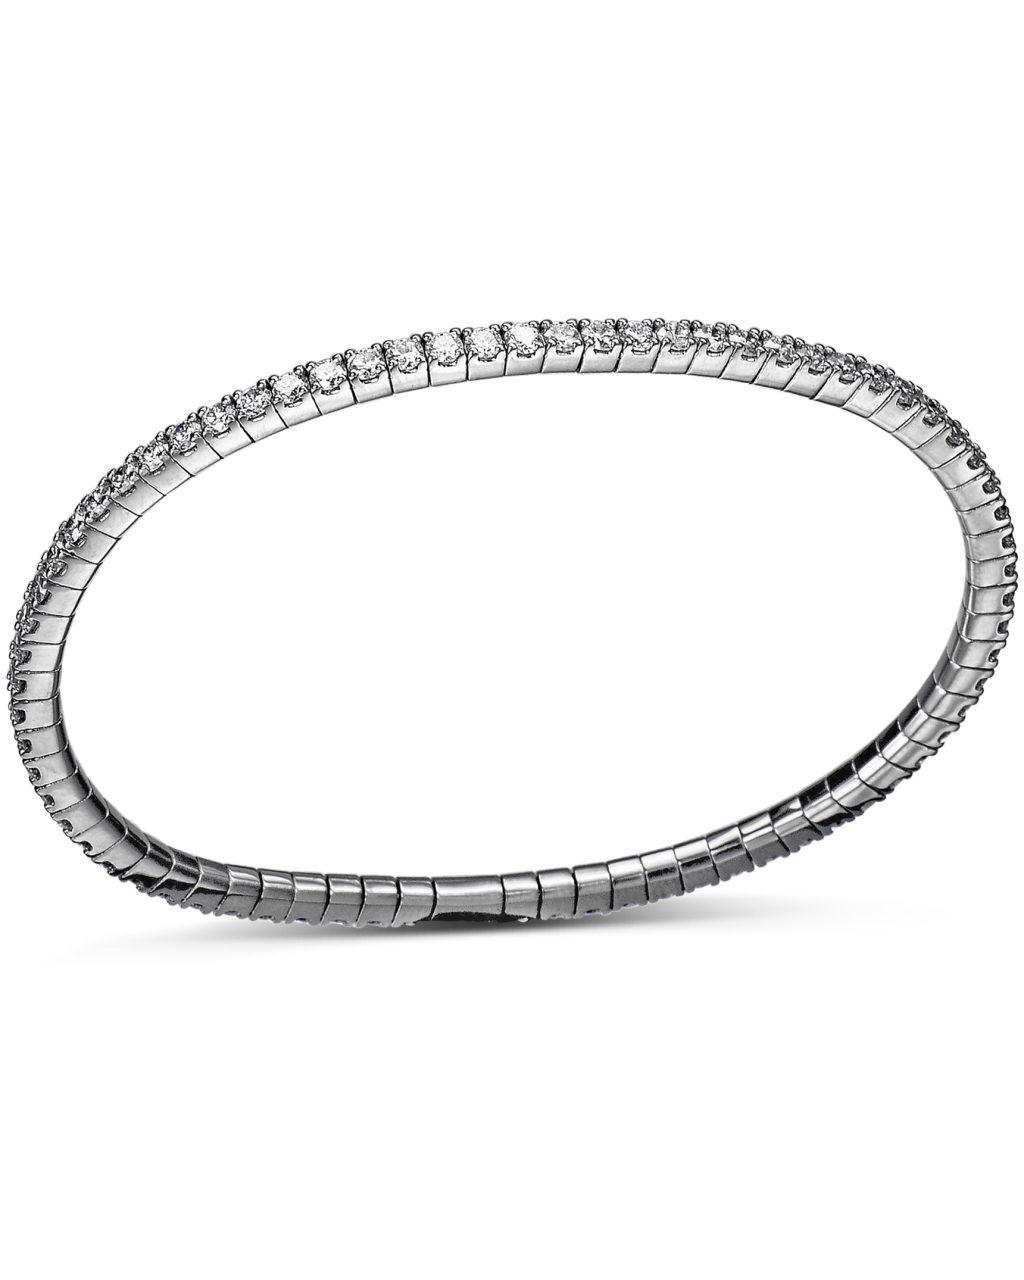 White Gold Diamond Flex Bracelet by Bez Ambar